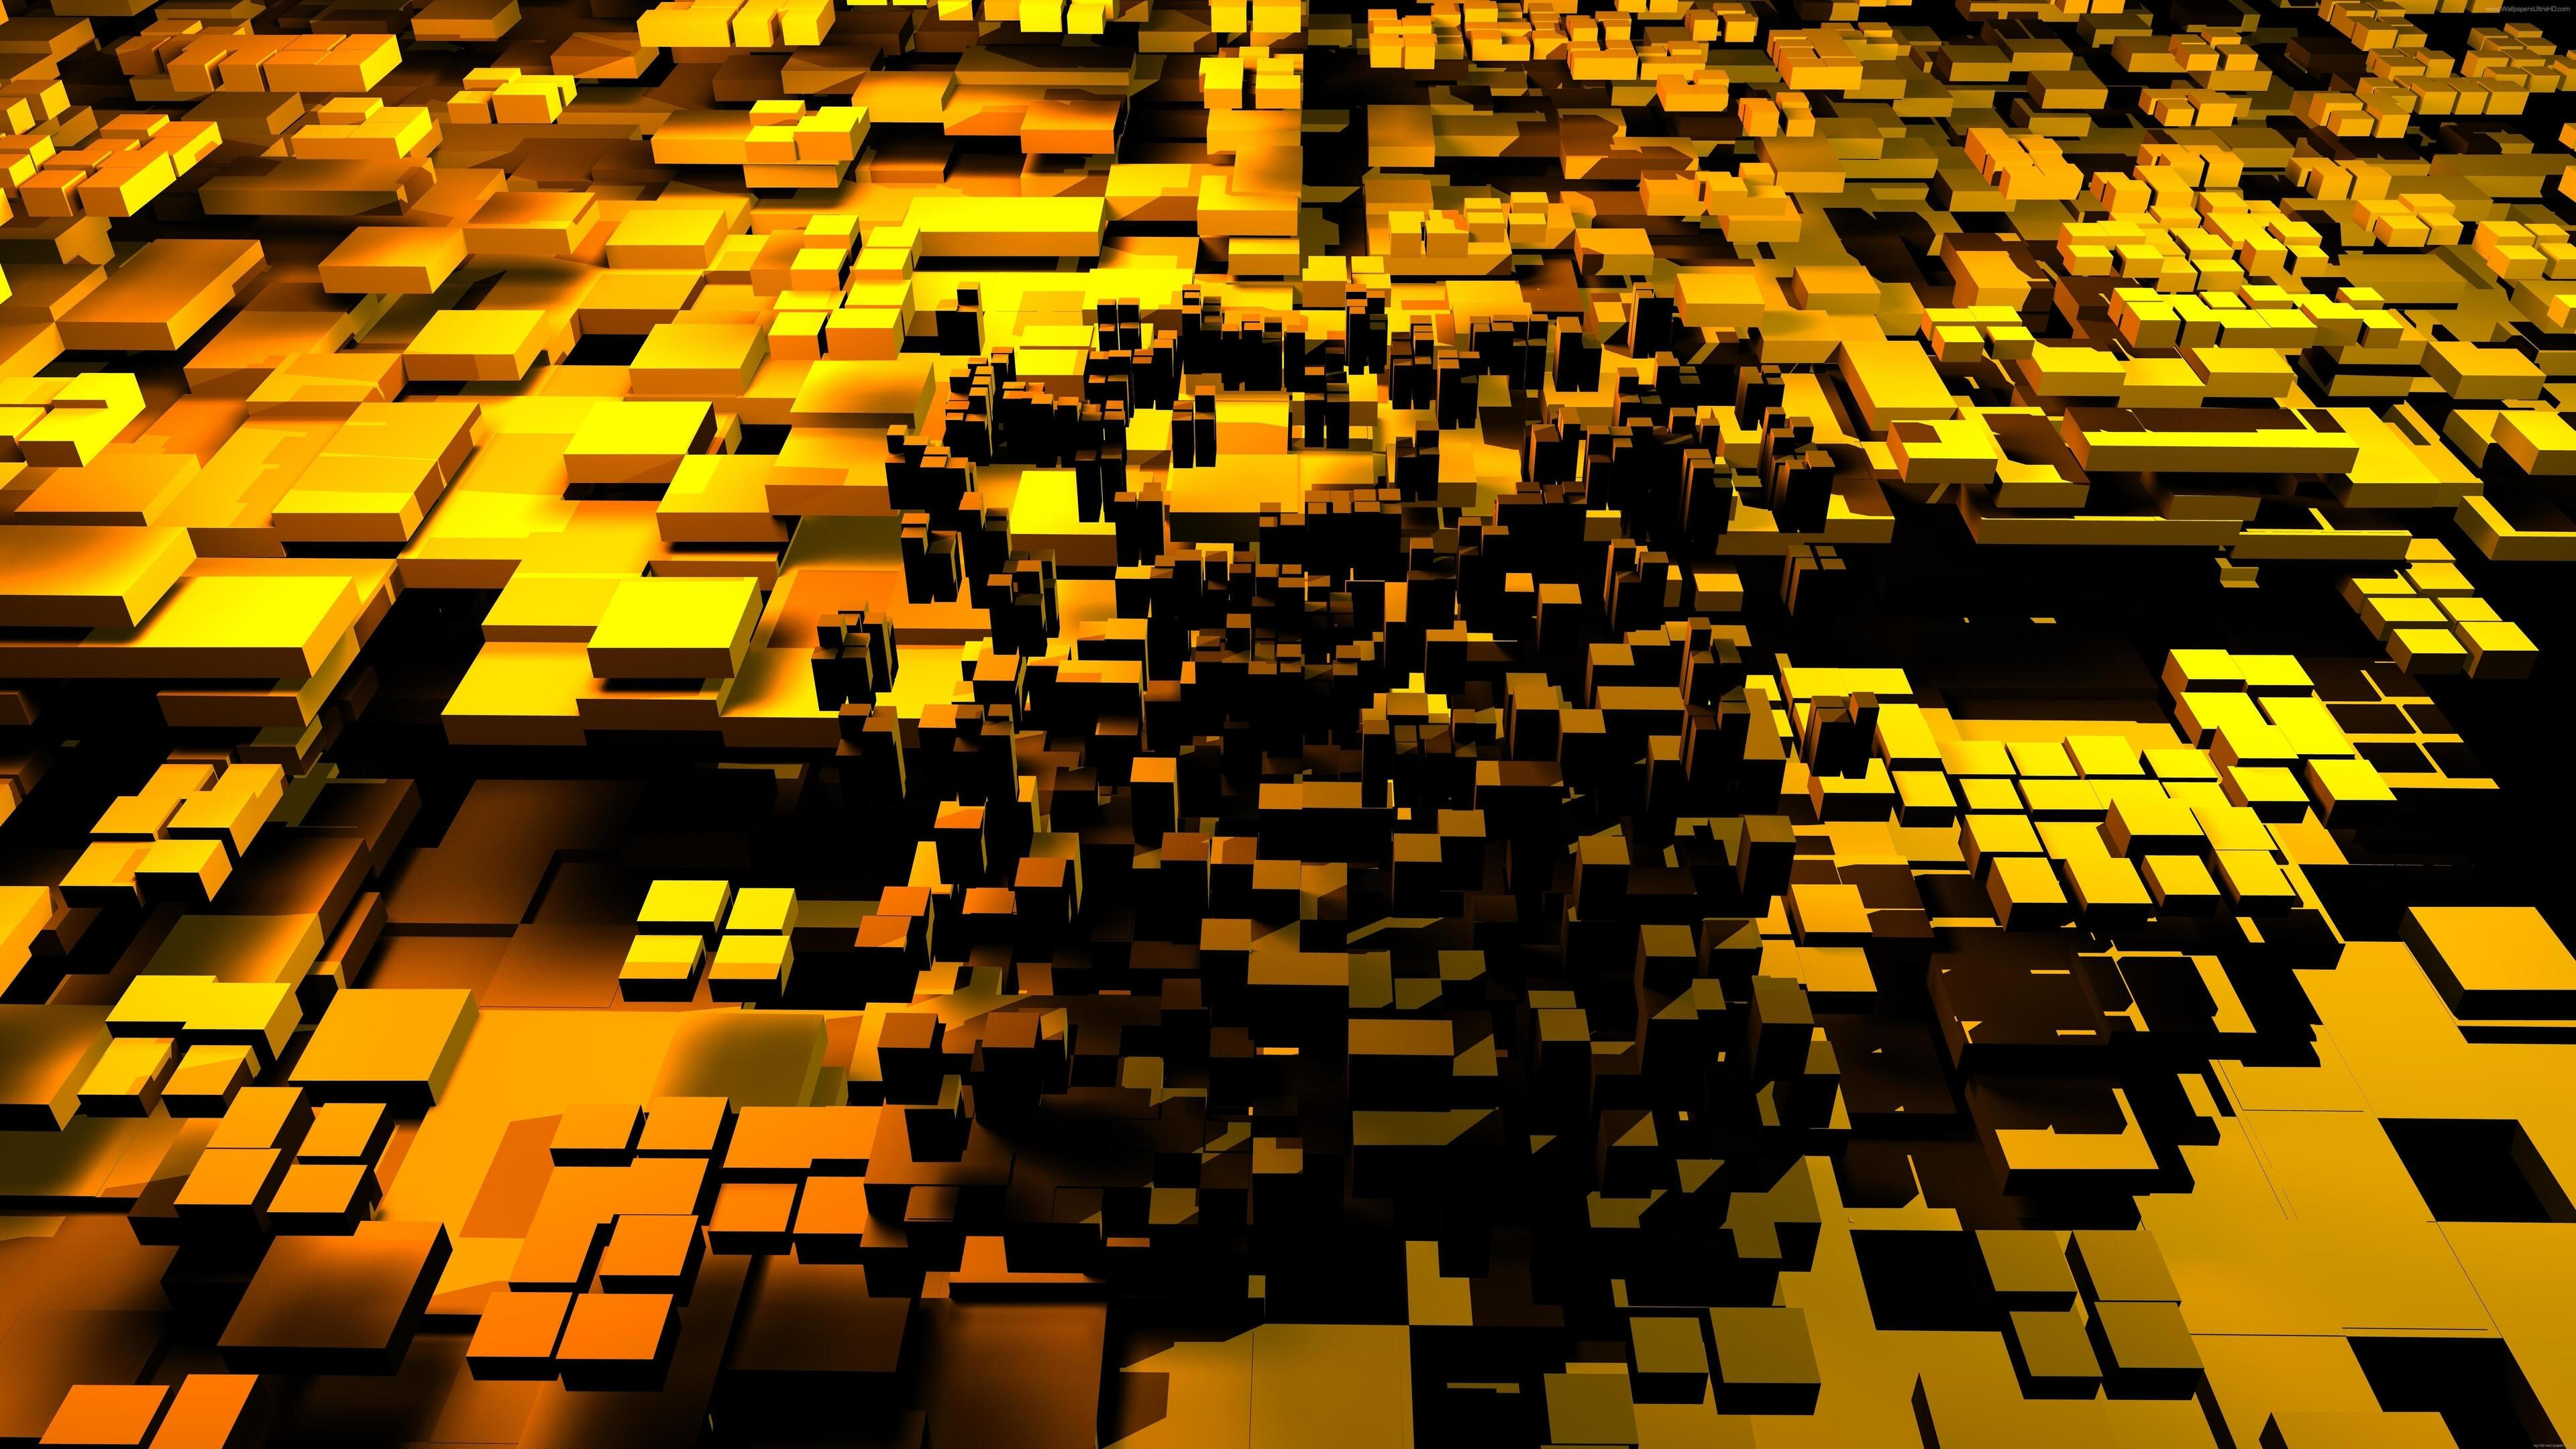 3840x2160 3d Cubes Gold 5k 4k Hd 4k Wallpapers Images